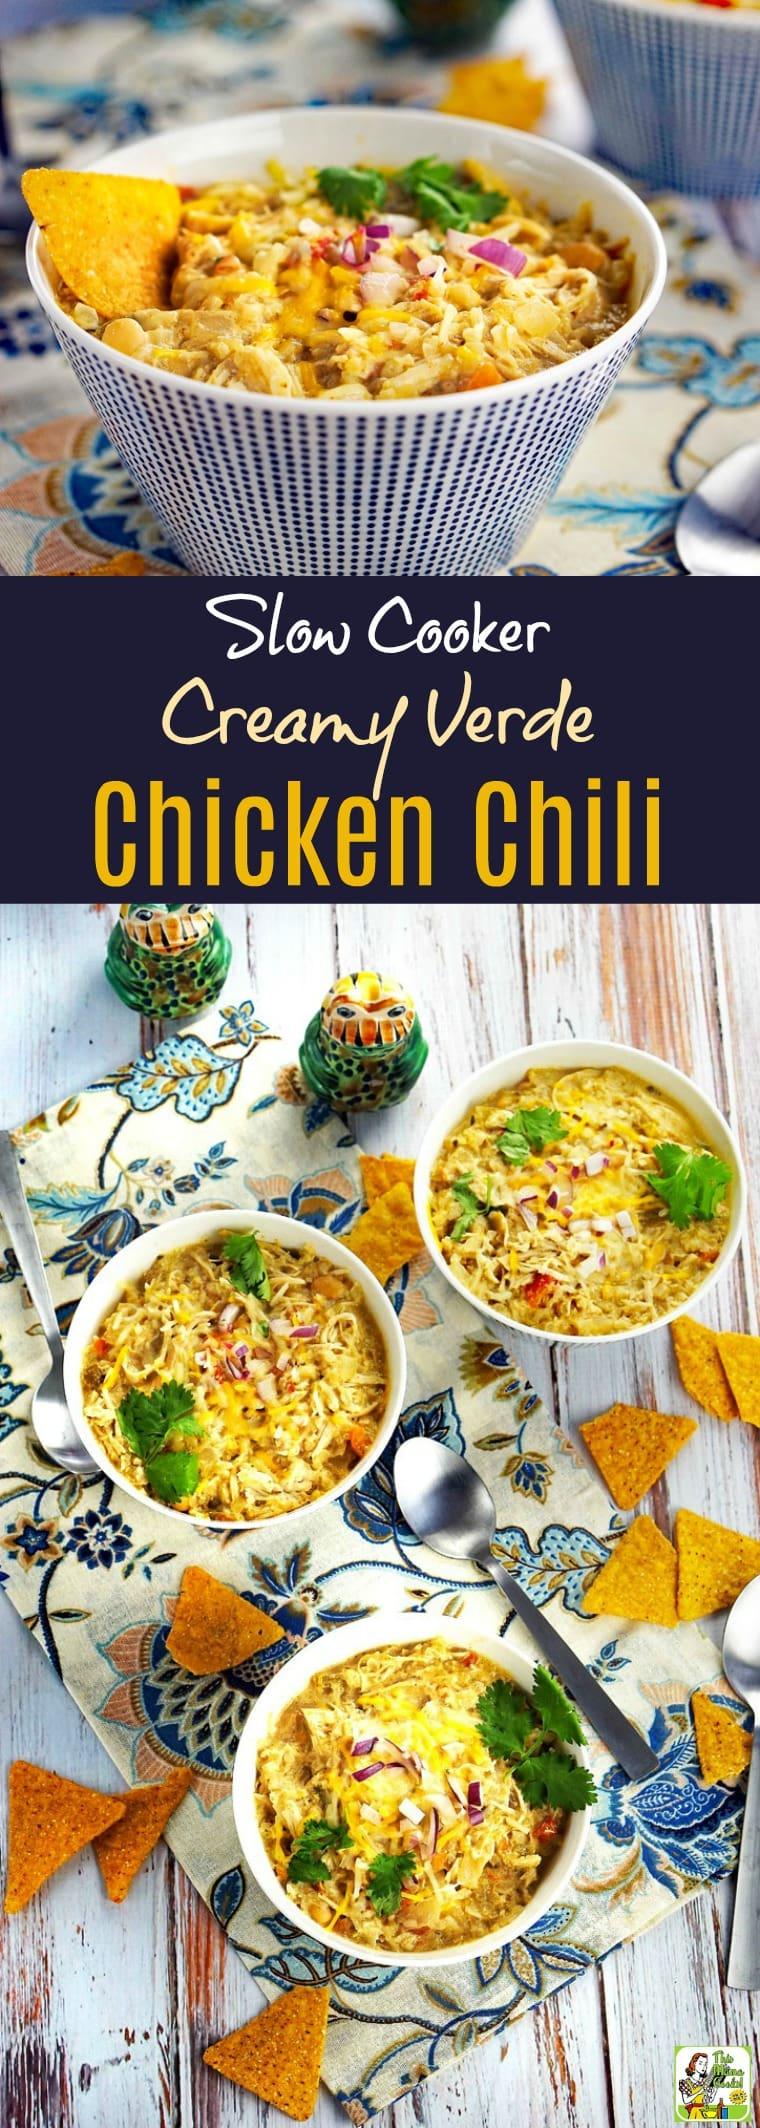 Slow Cooker Creamy Verde Chicken Chili